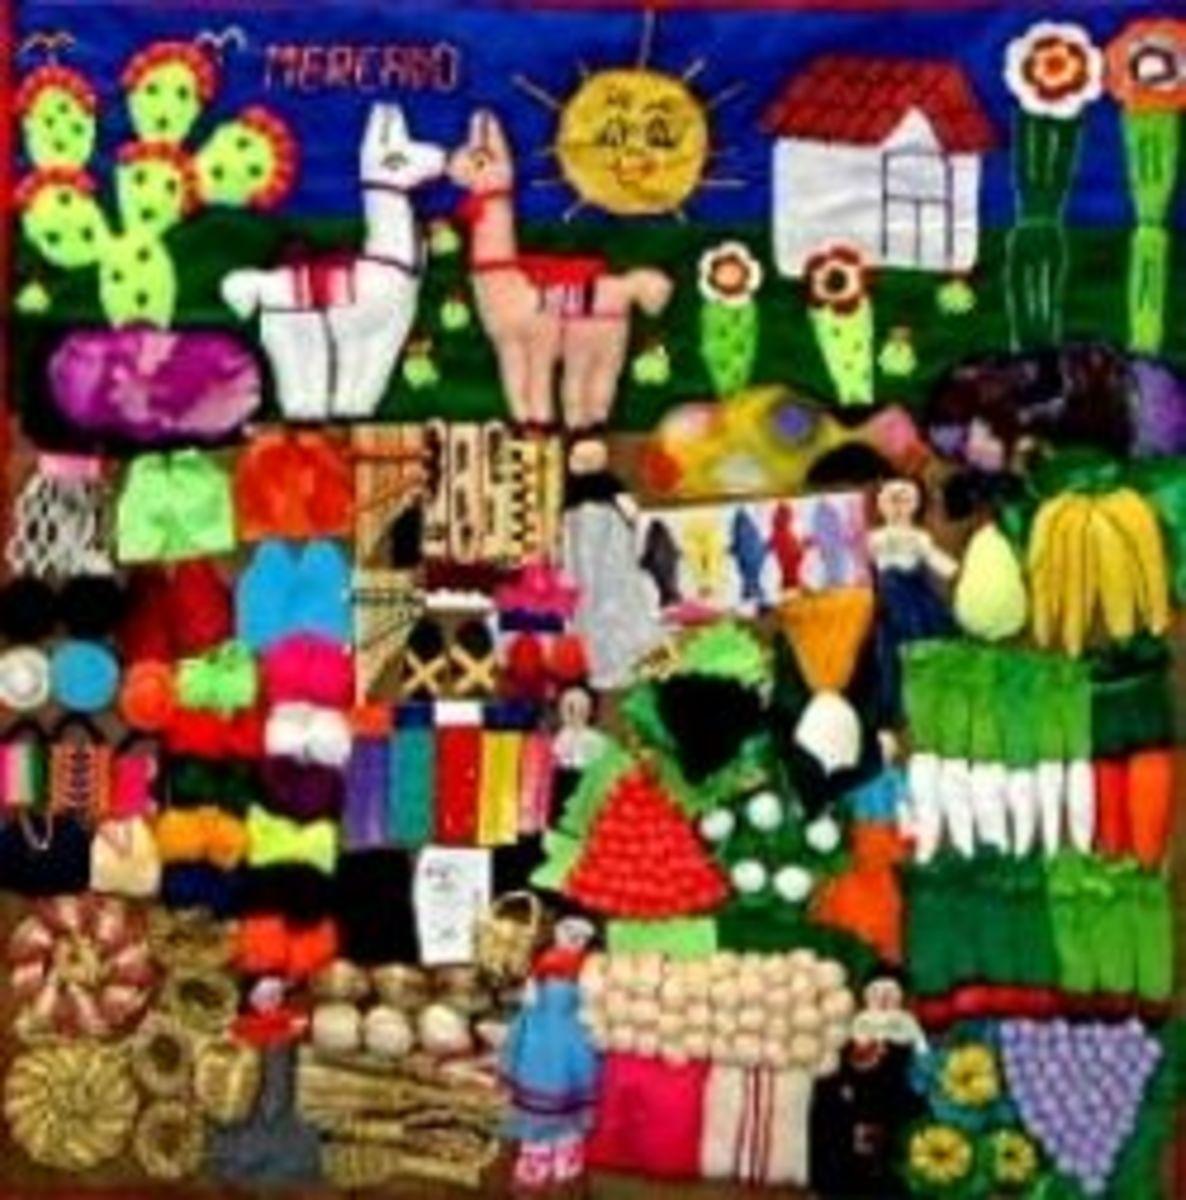 Arpillera of a Market Scene